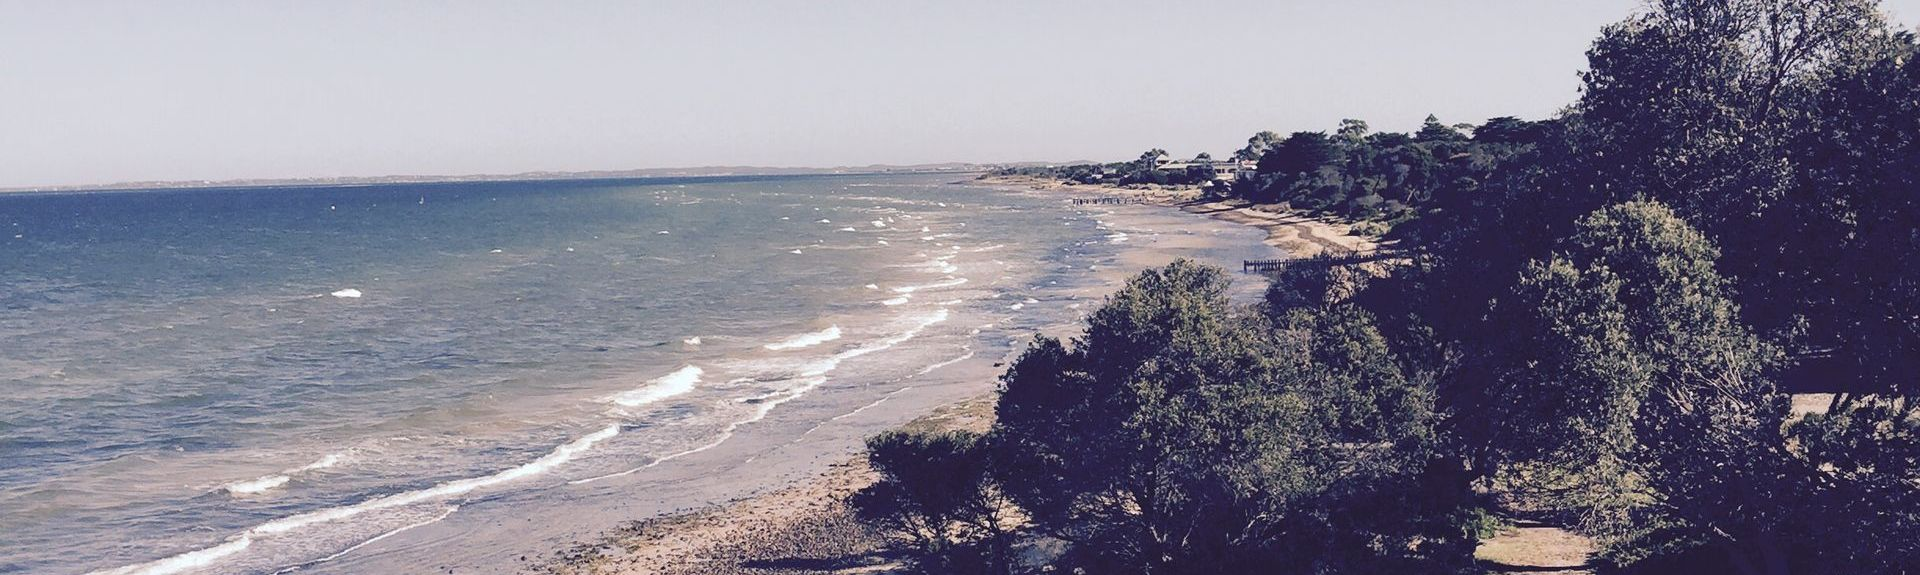 Point Cook, Victoria, Australia